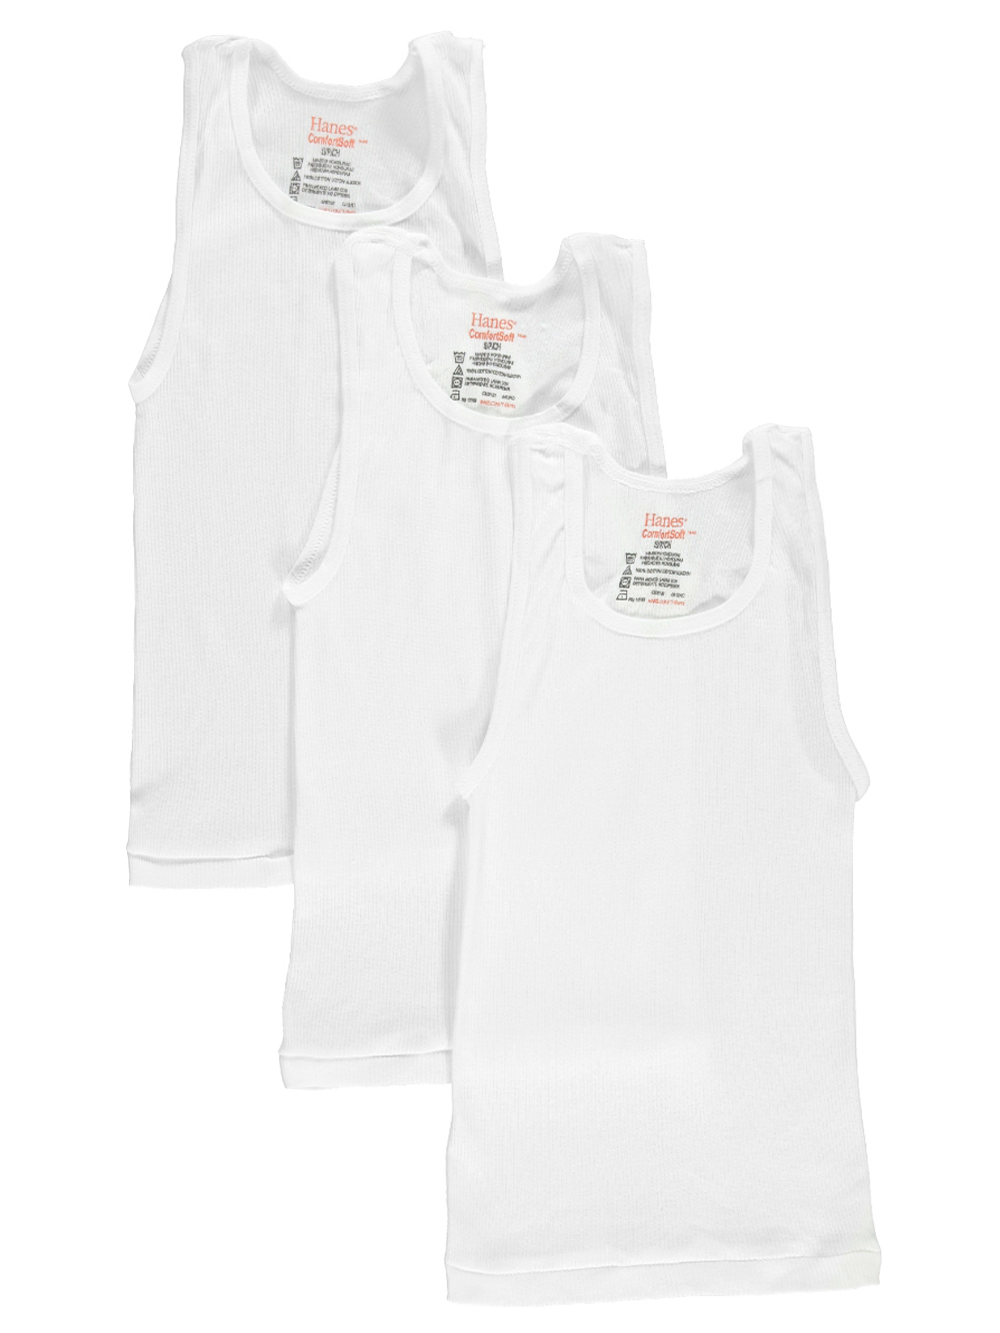 Image of Hanes Little Boys 3Pack Tagless Tanks Sizes 4  7  white 6  8